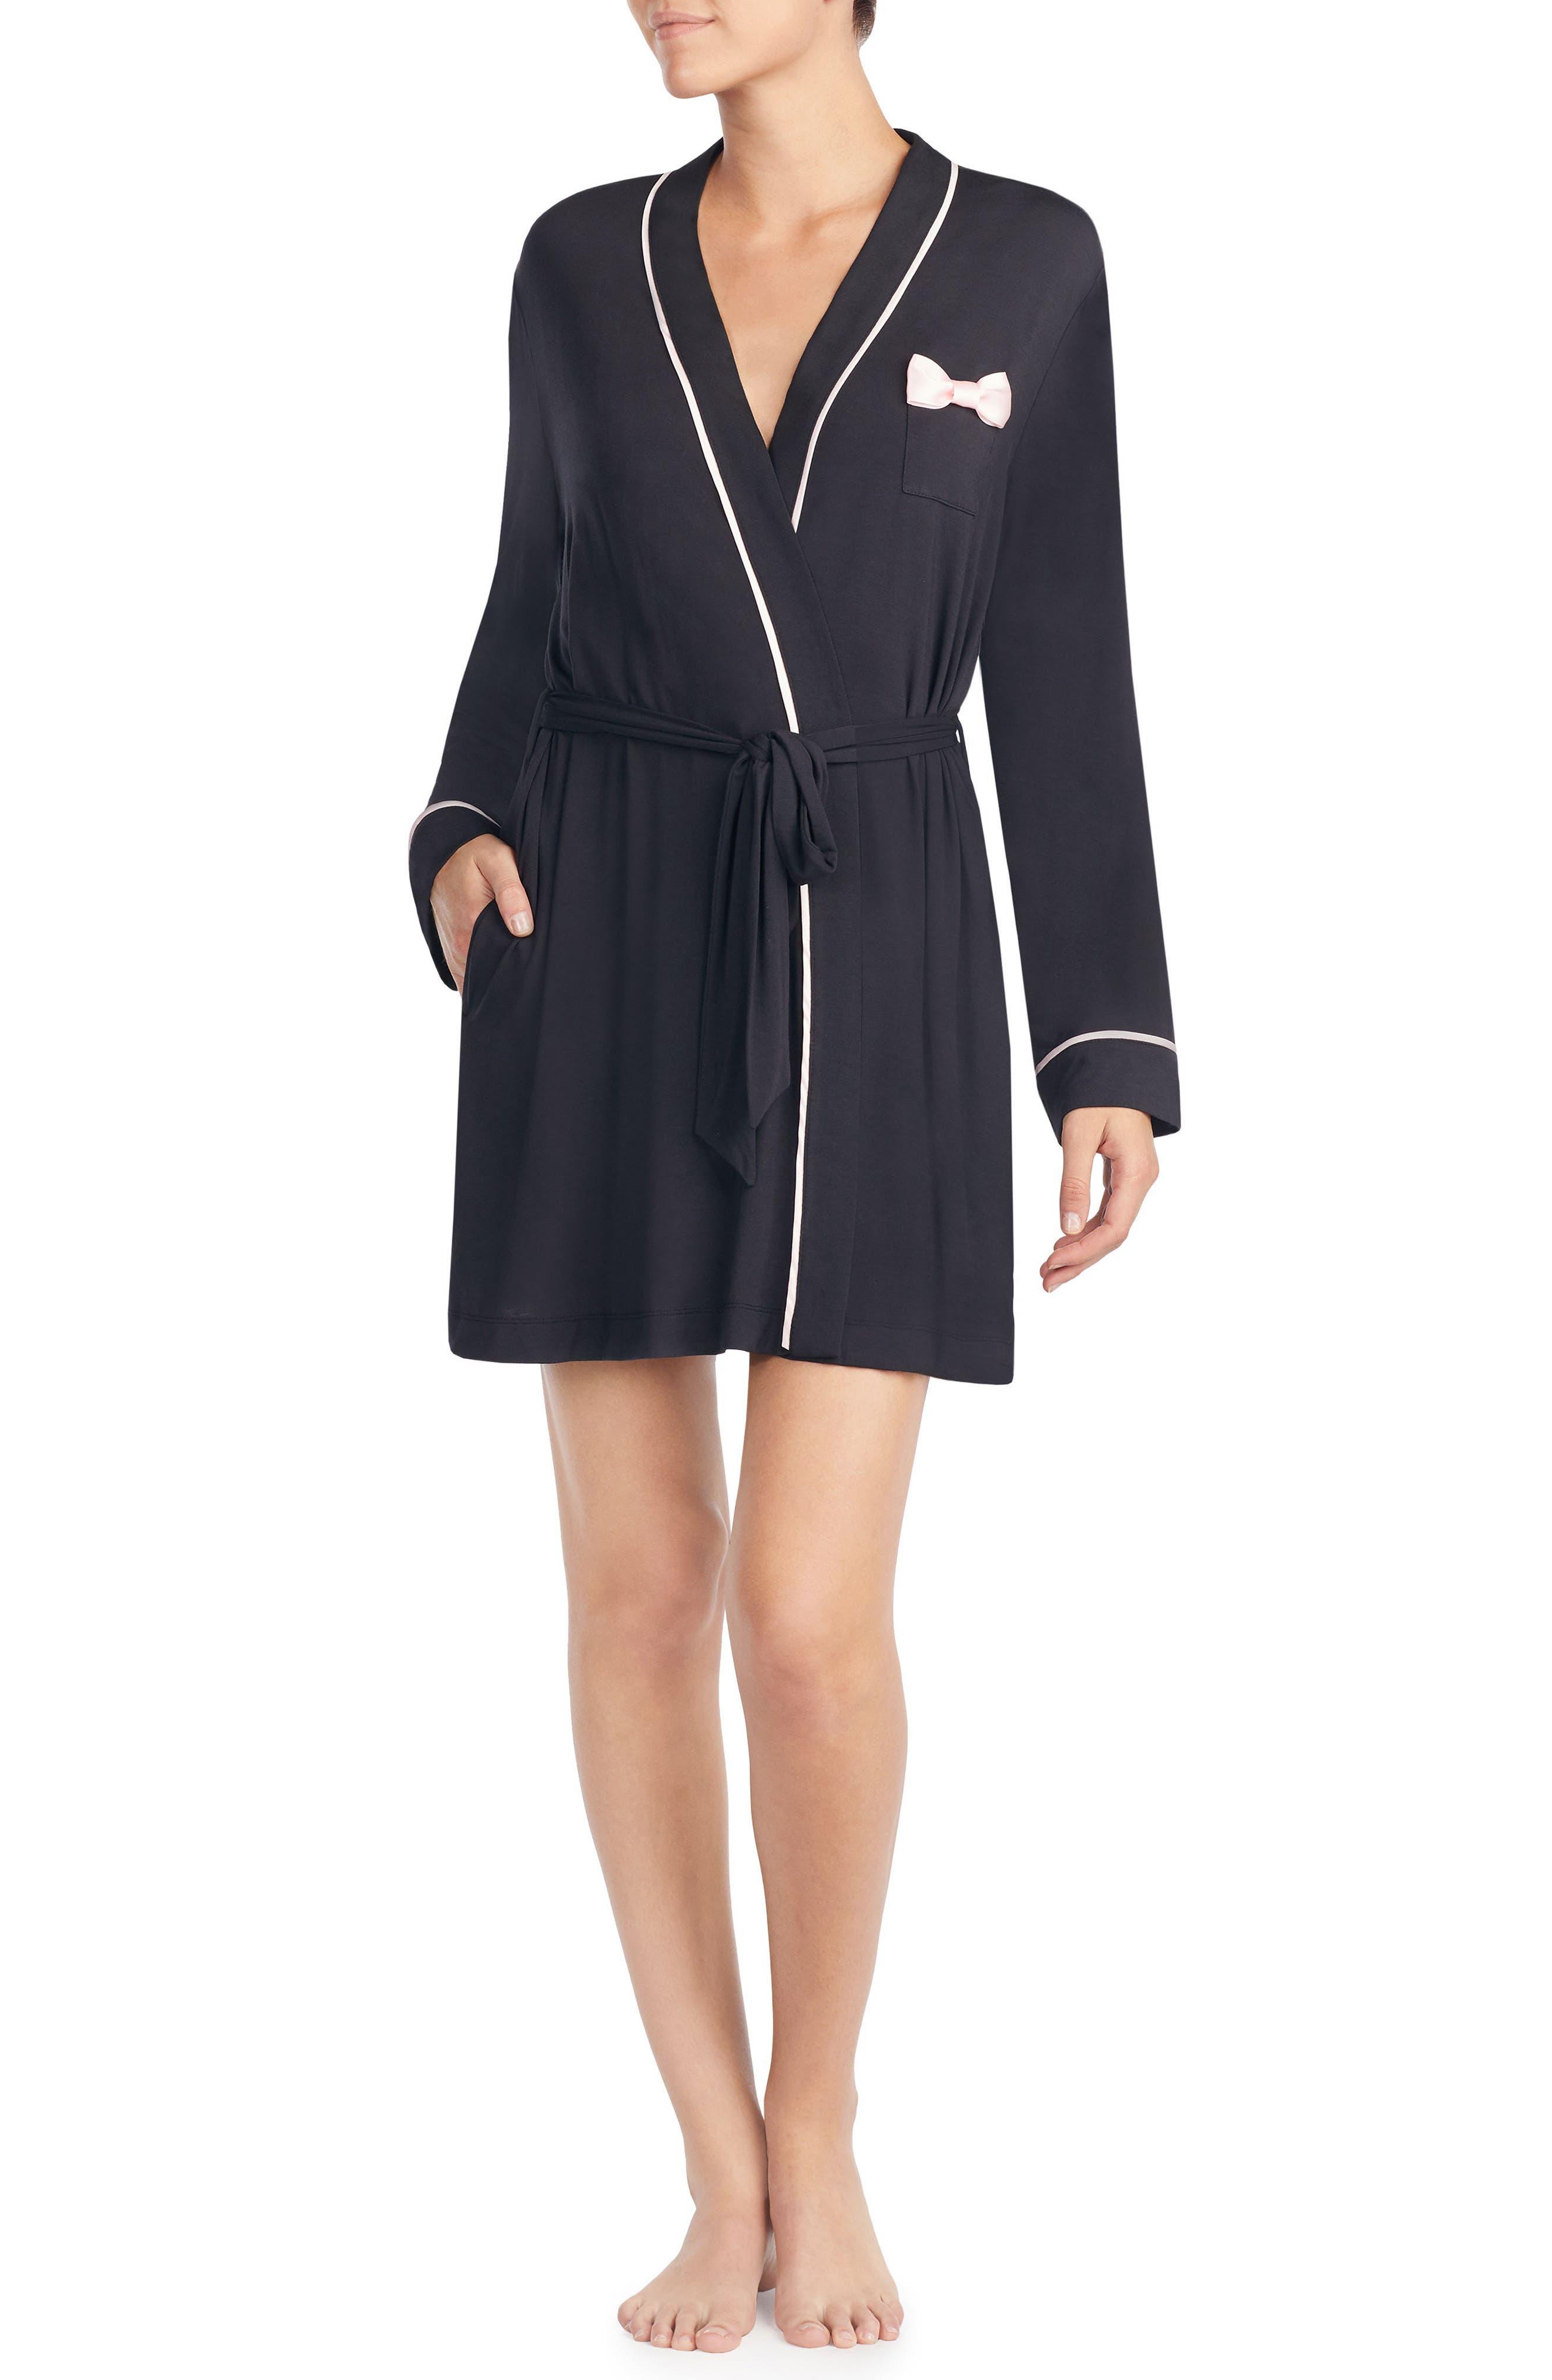 KATE SPADE NEW YORK, jersey short robe, Main thumbnail 1, color, BLACK